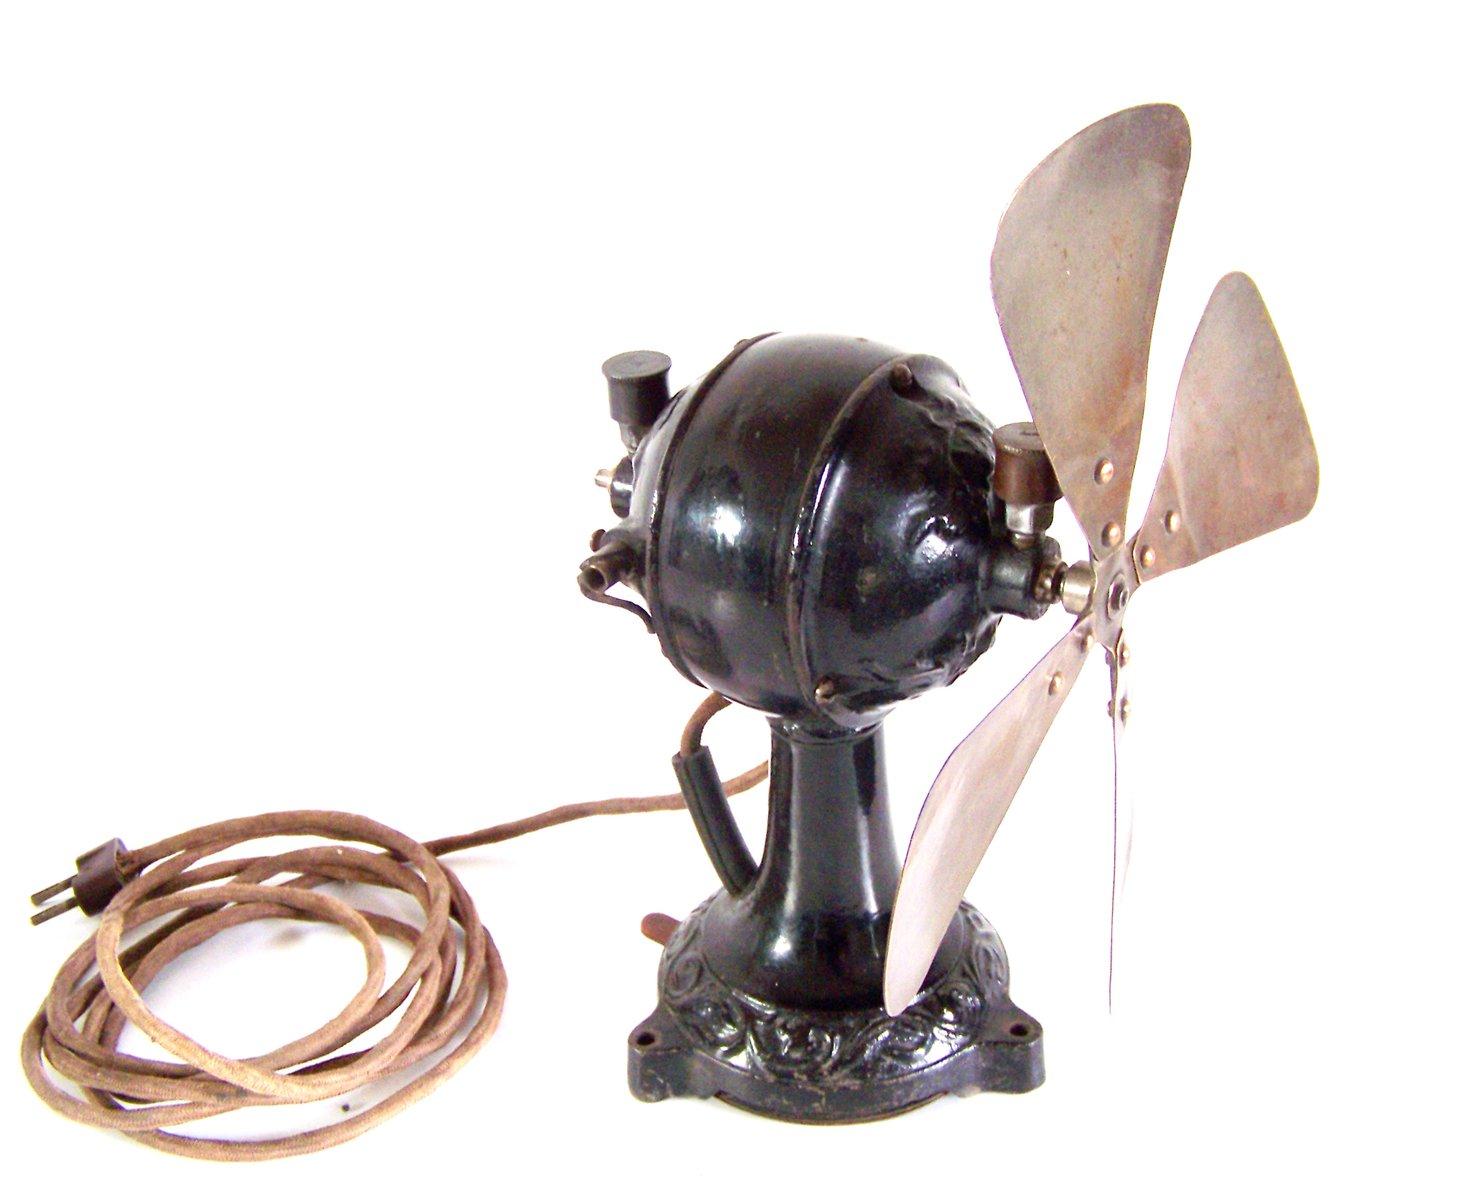 Antique Desk Fan 1910s For Sale At Pamono